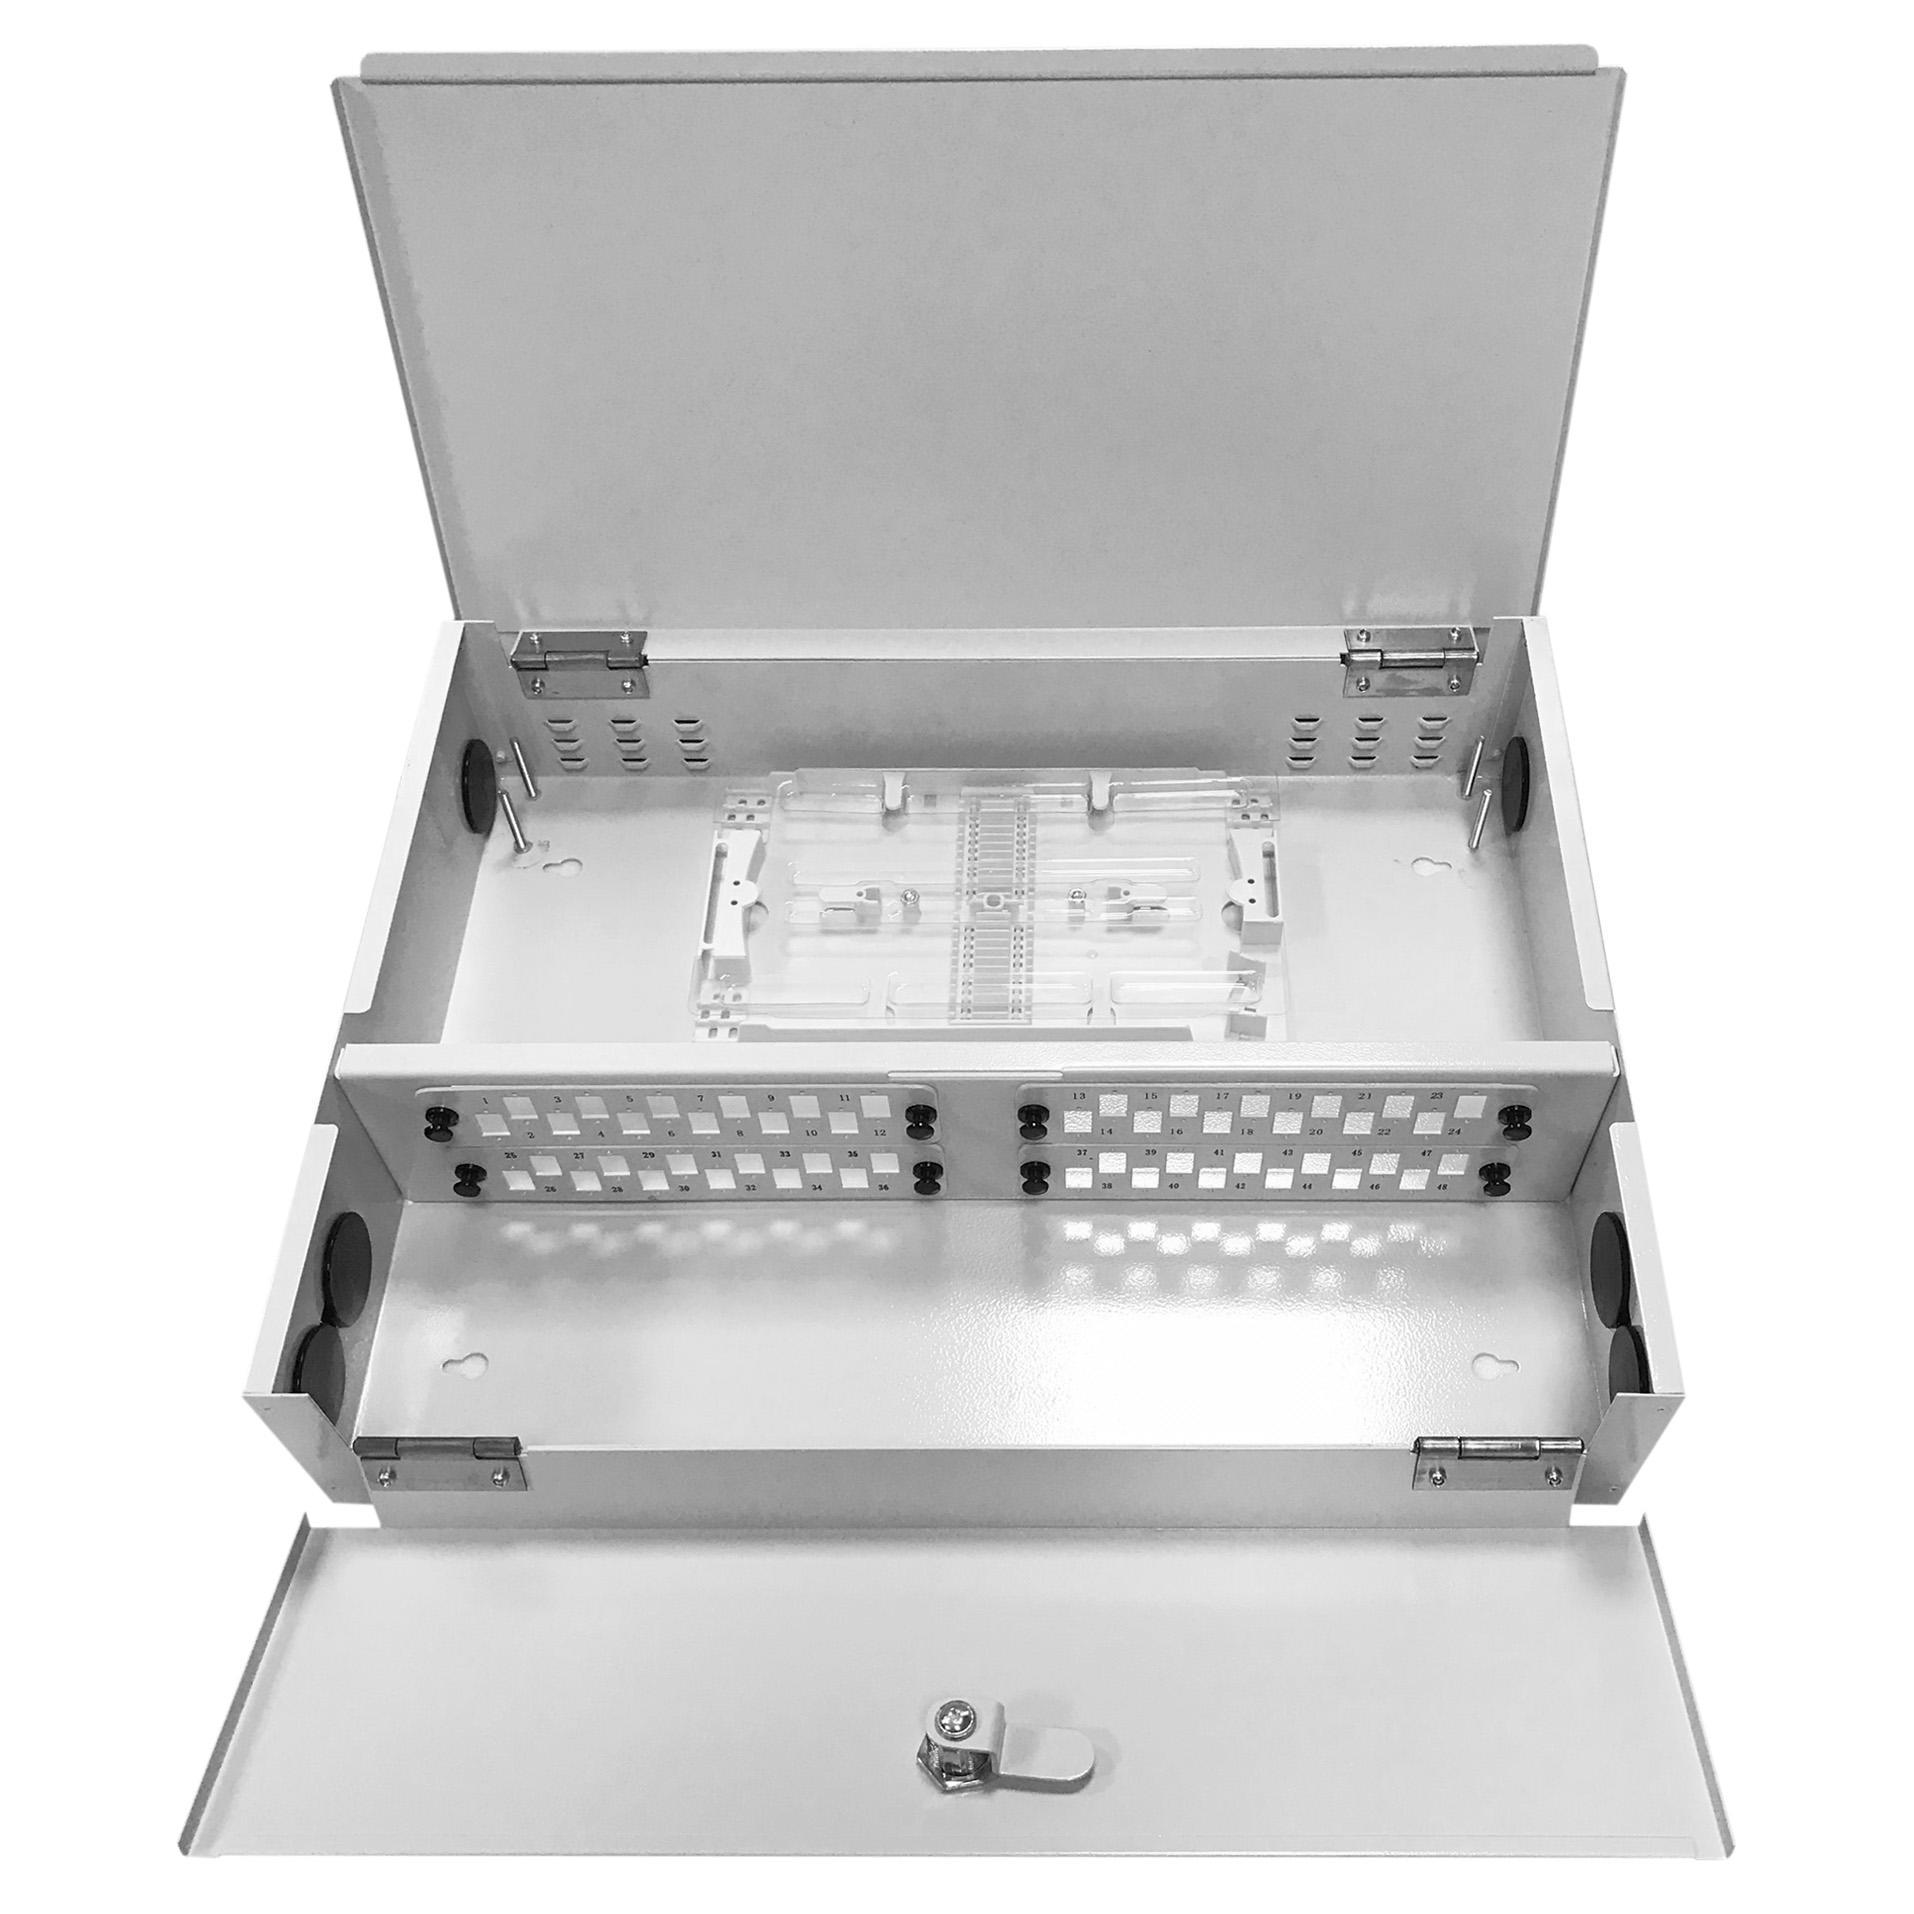 48 Port WODF Fiber Optic Distribution Box, 24 Cores Tray, Threaded Stem